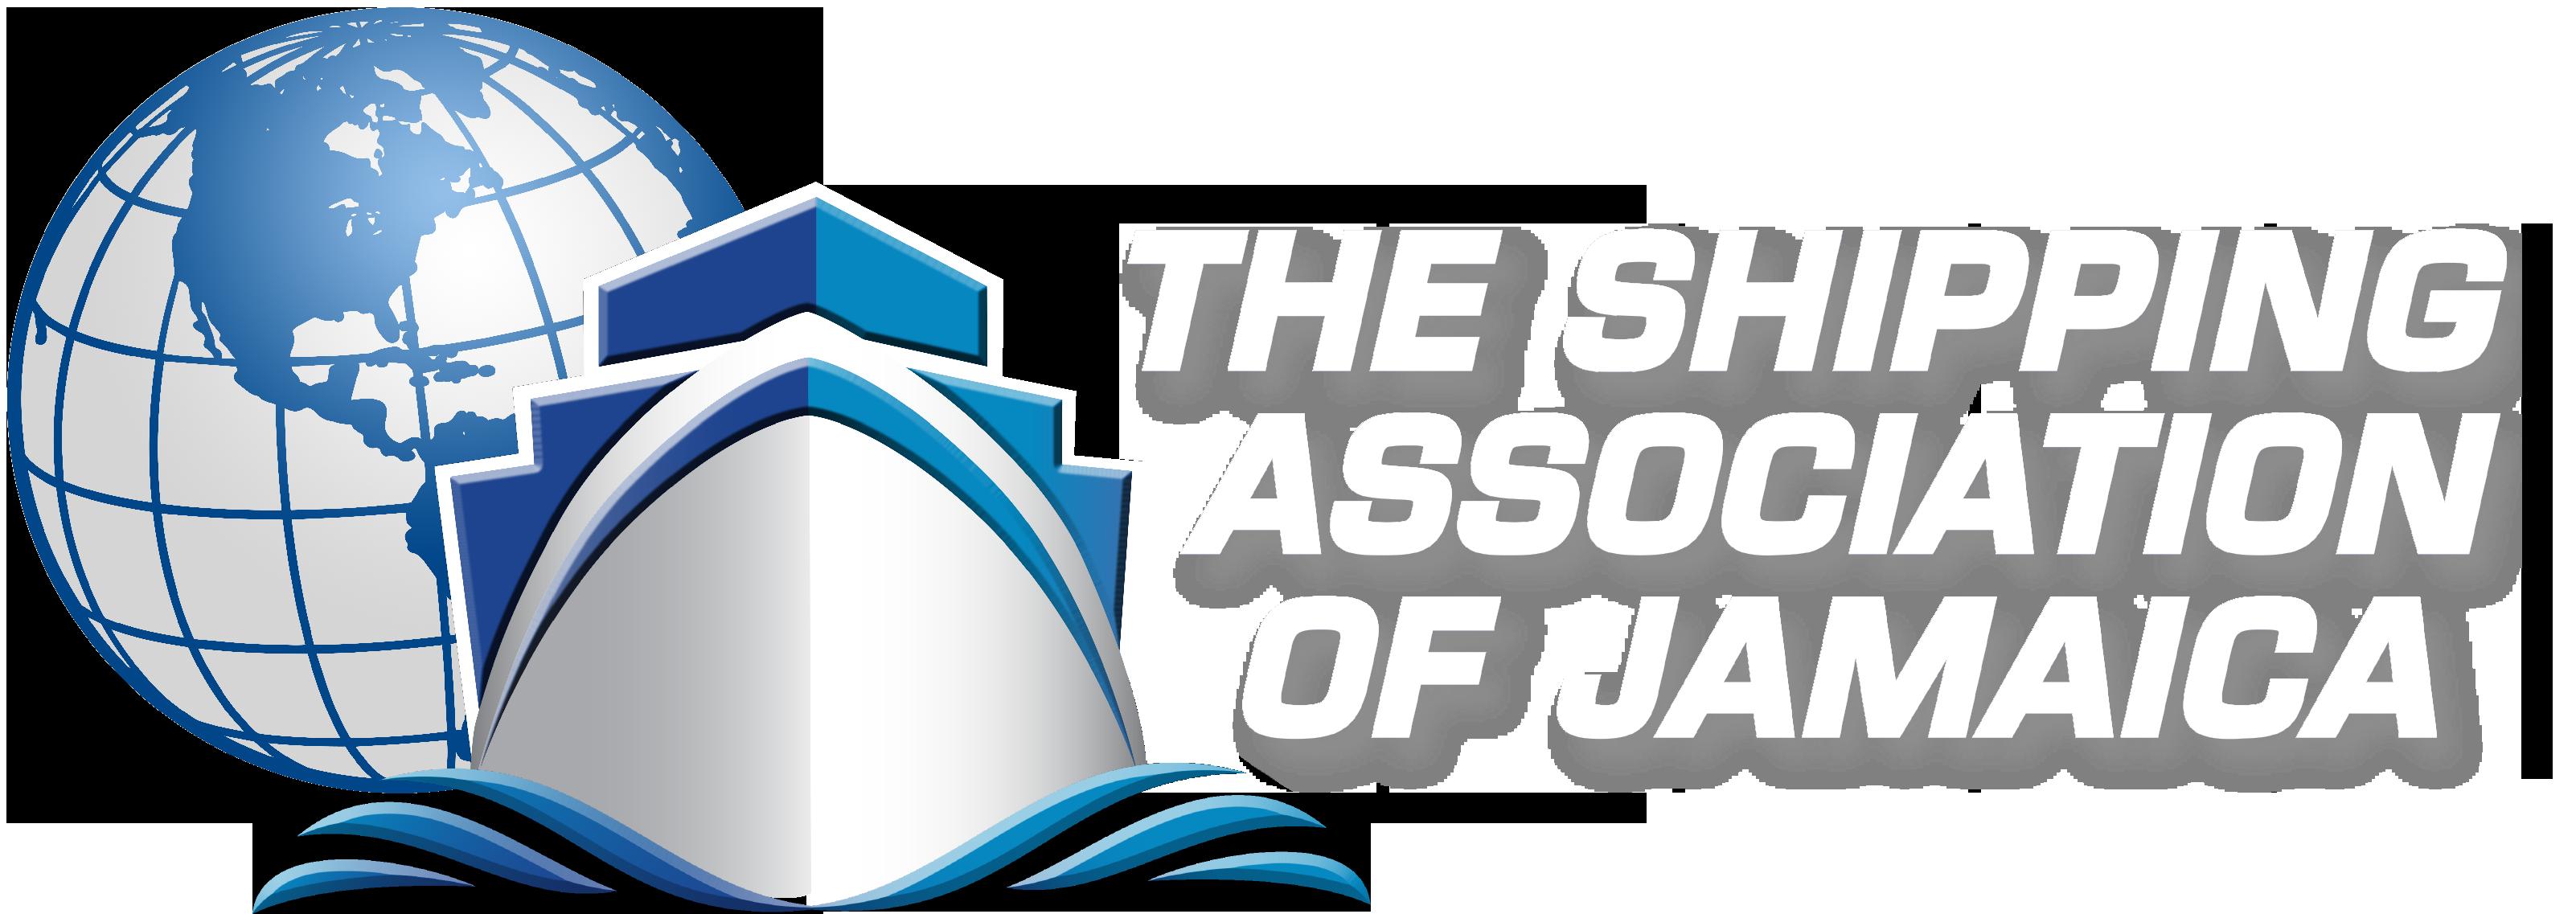 faqs shipping association of jamaica